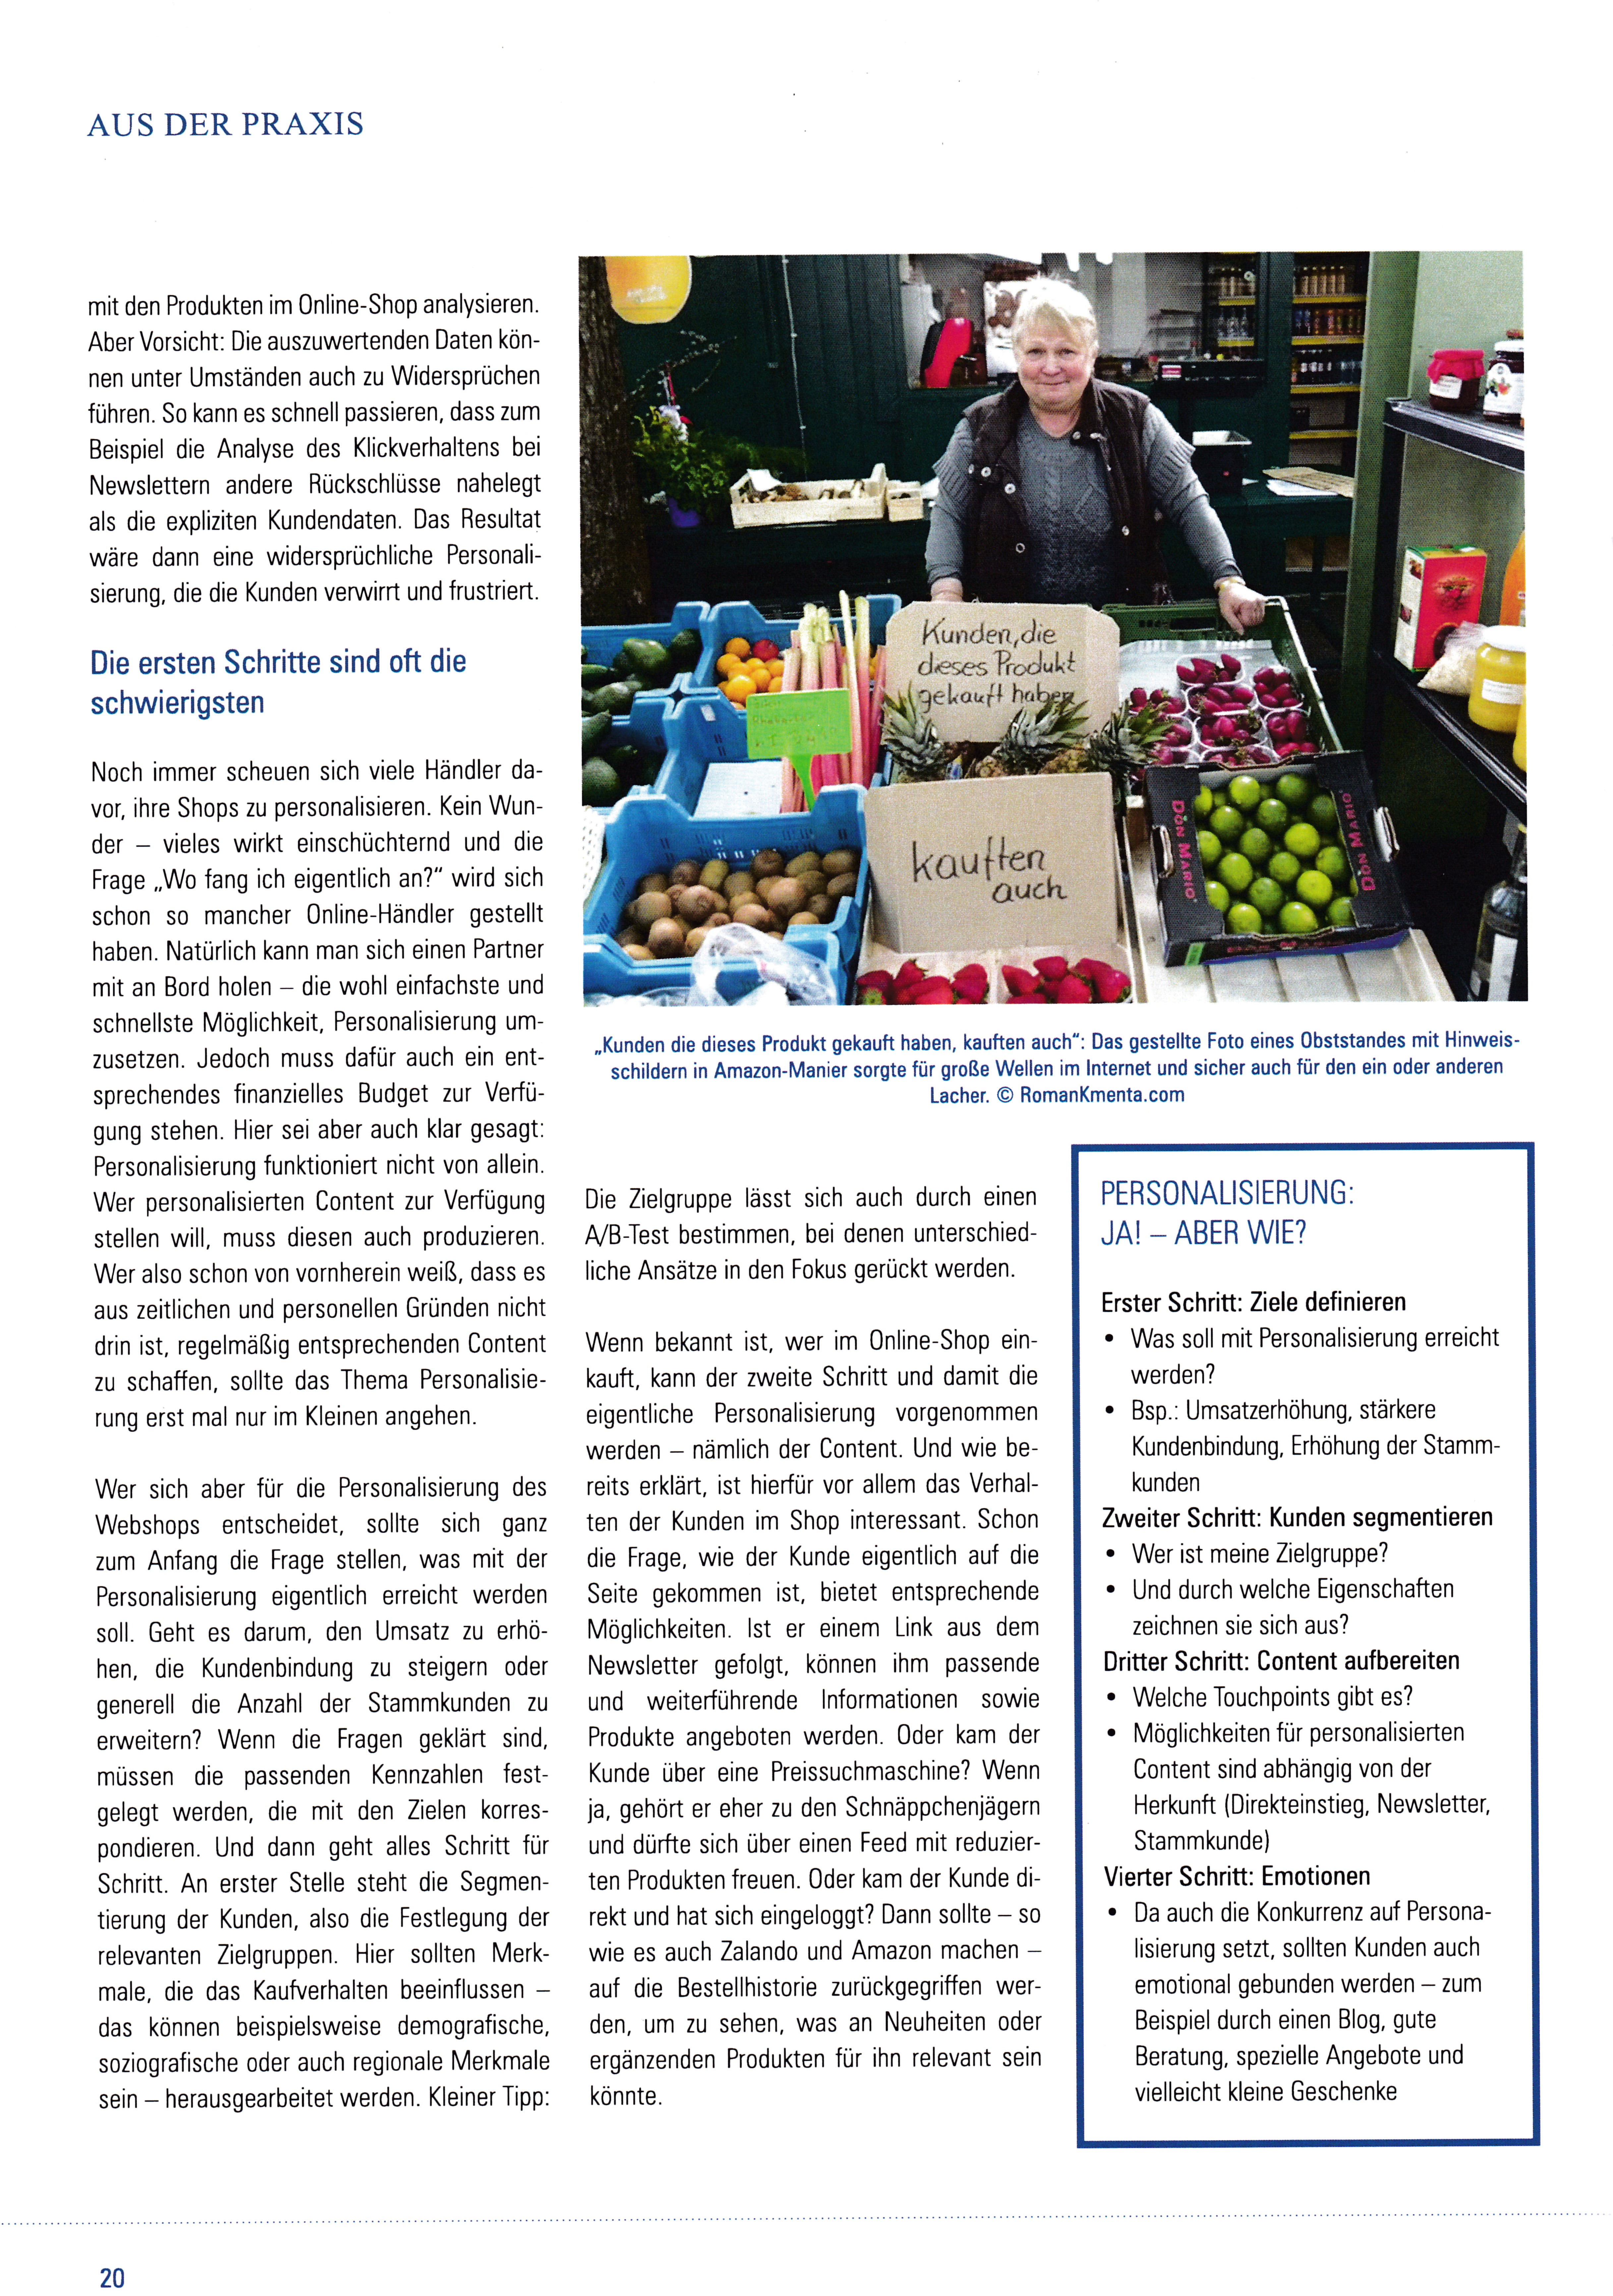 Online Händler Magazin 03-2017 1 - Obststand - USP - Roman Kmenta - Ideendesigner